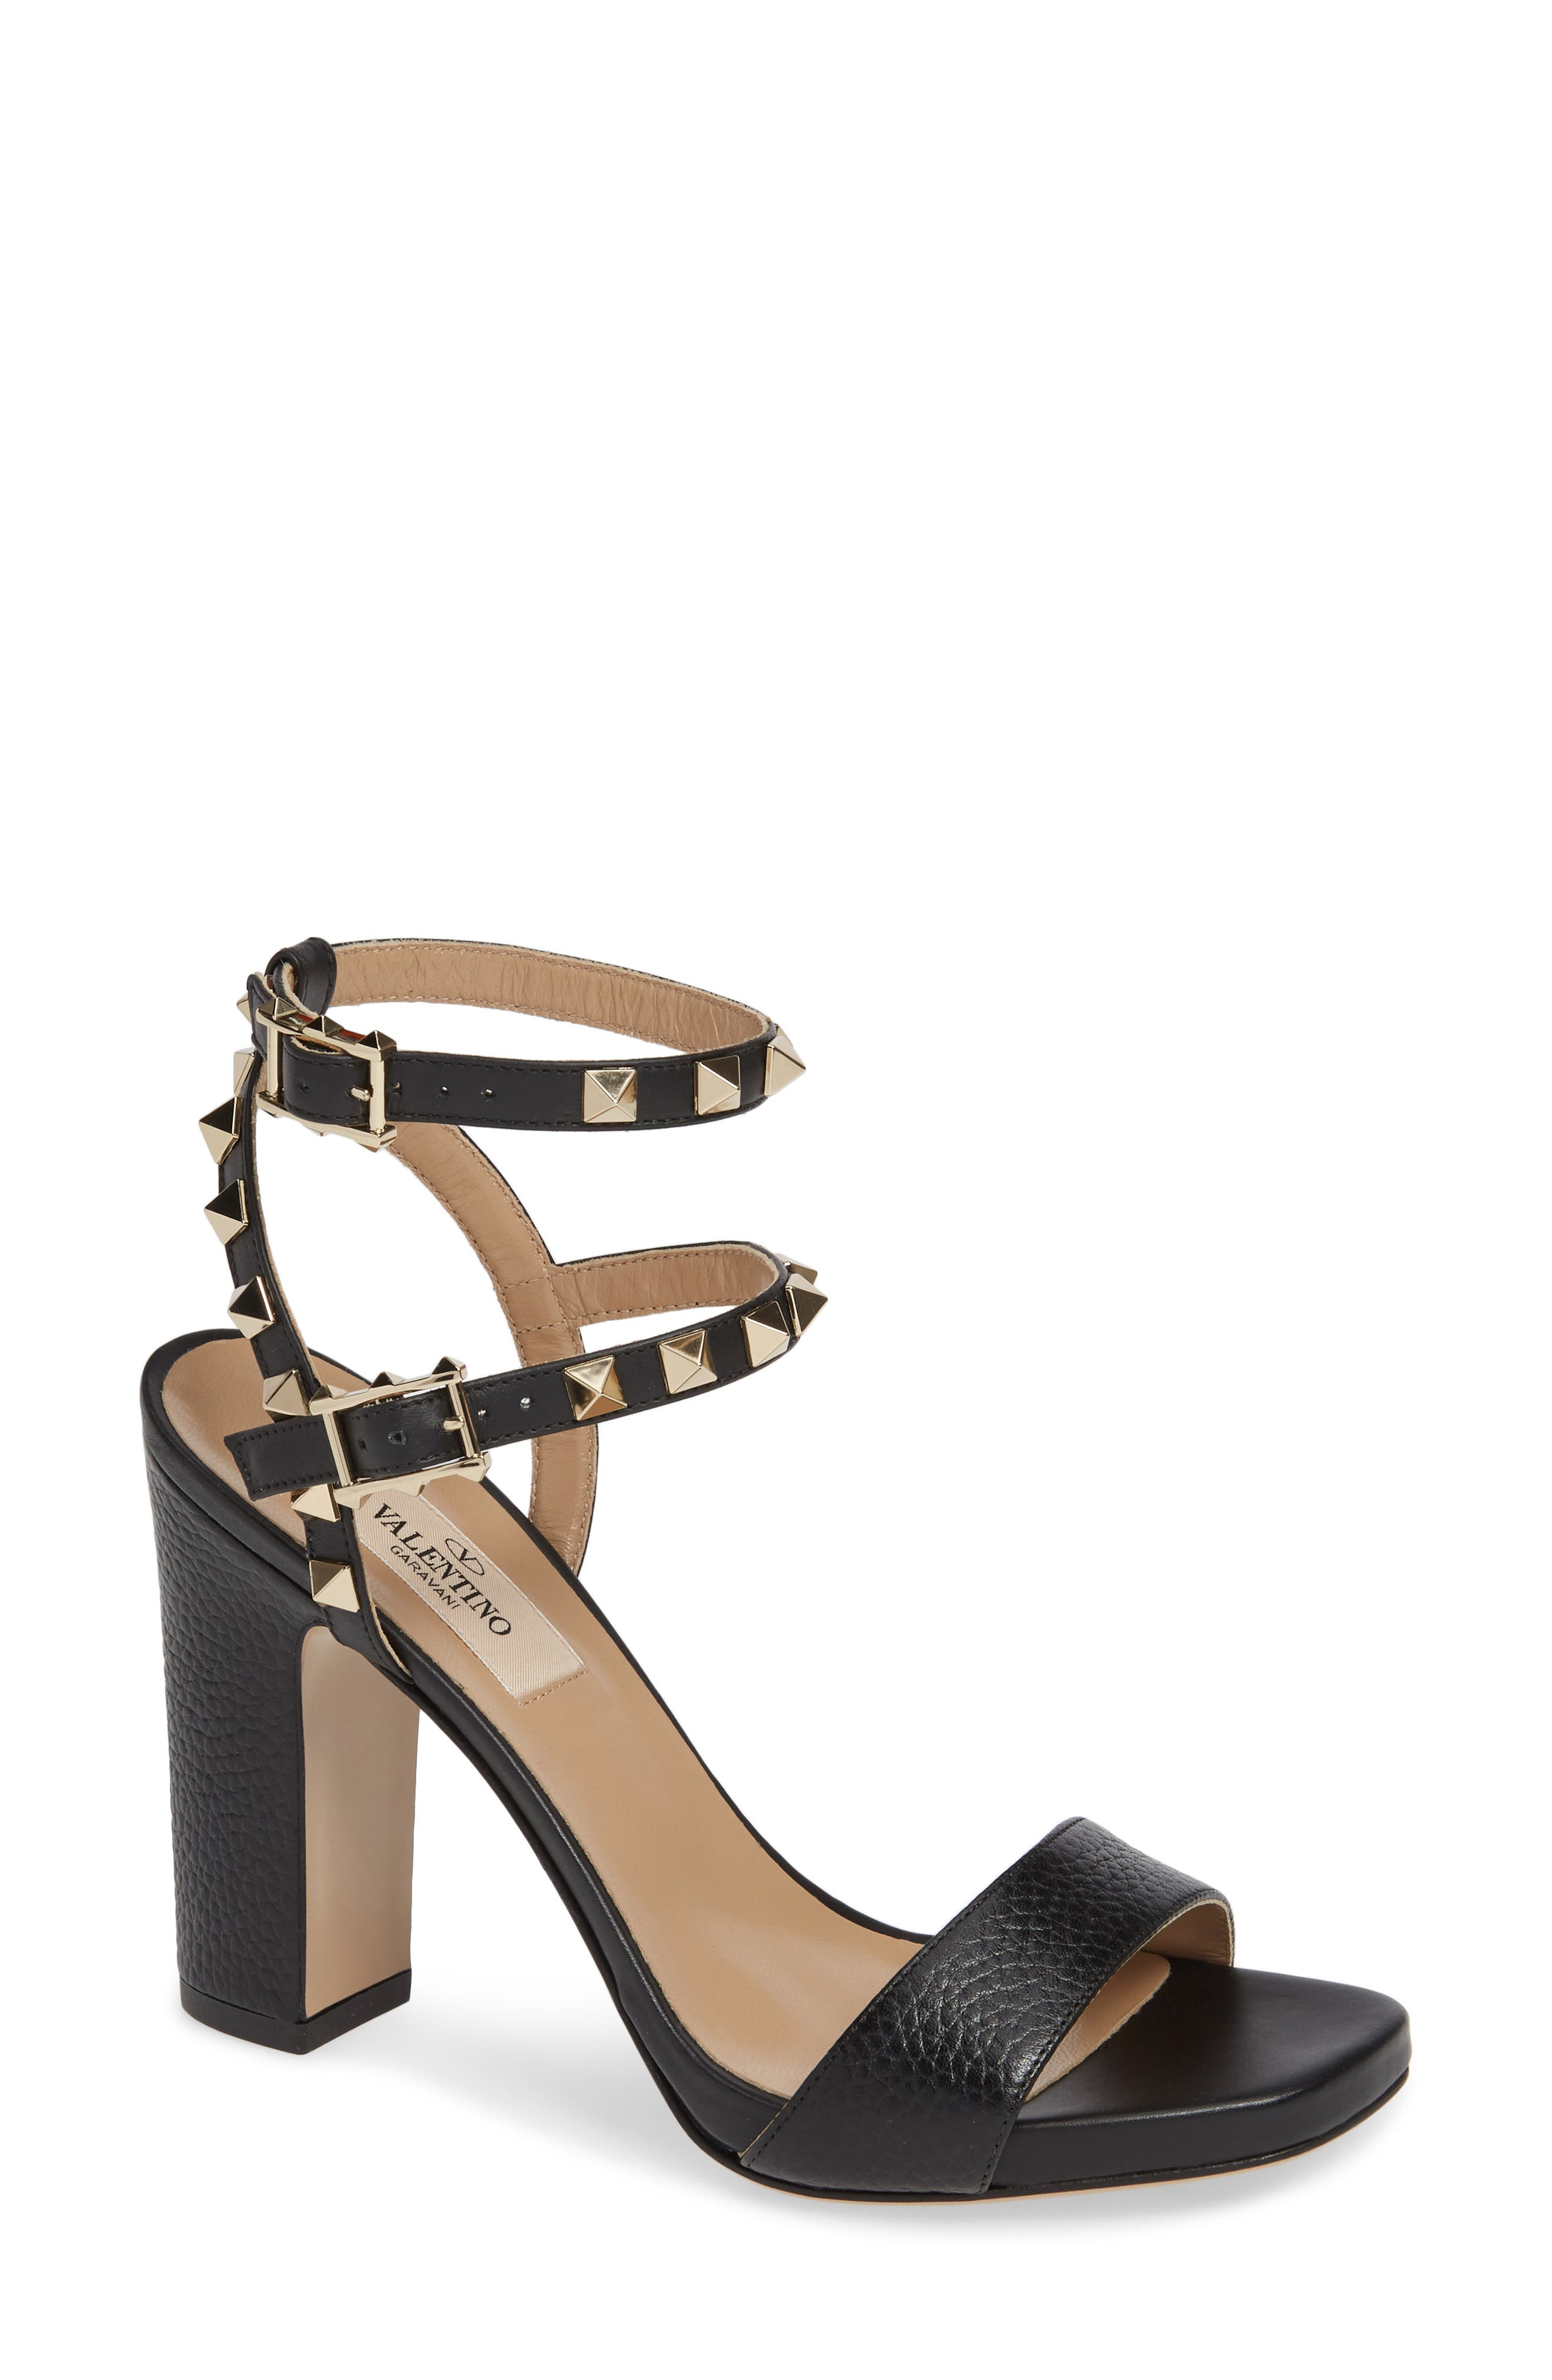 VALENTINO GARAVANI Rockstud Ankle Strap Block Sandal, Main, color, BLACK/ BLACK